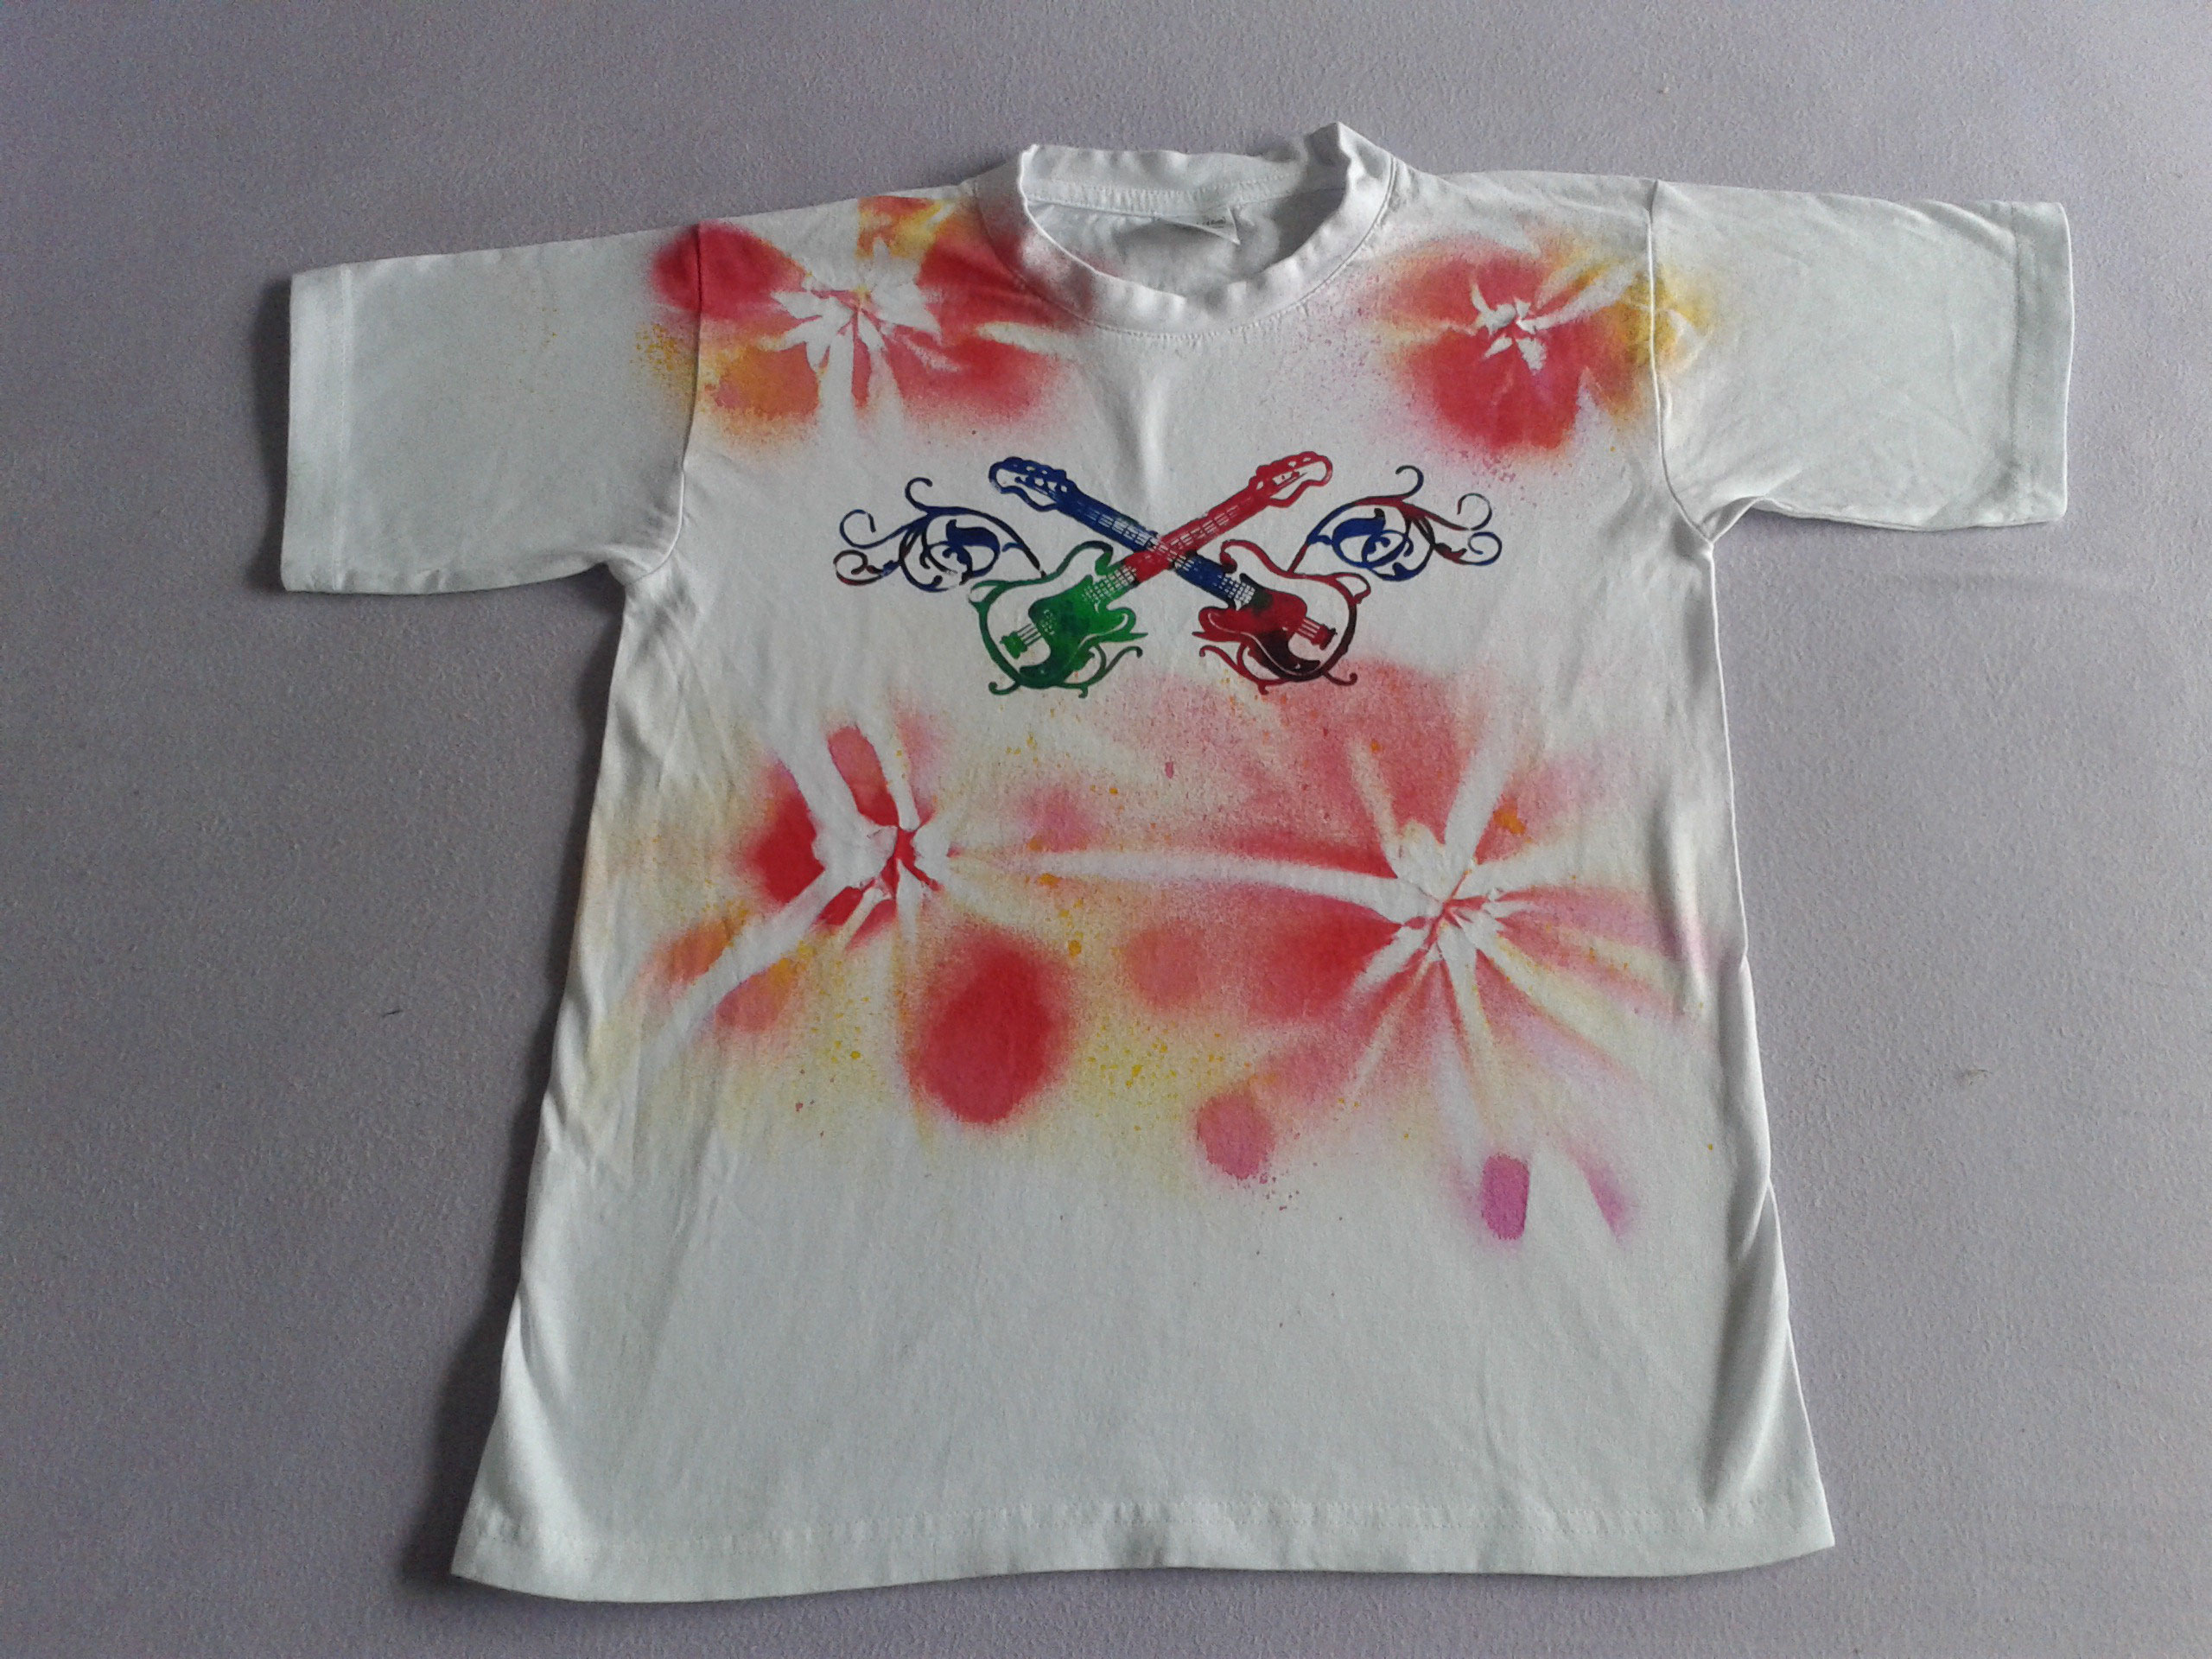 T Shirts Bemalen Kranzegger Kuhwerkstatt My Kuhle Art